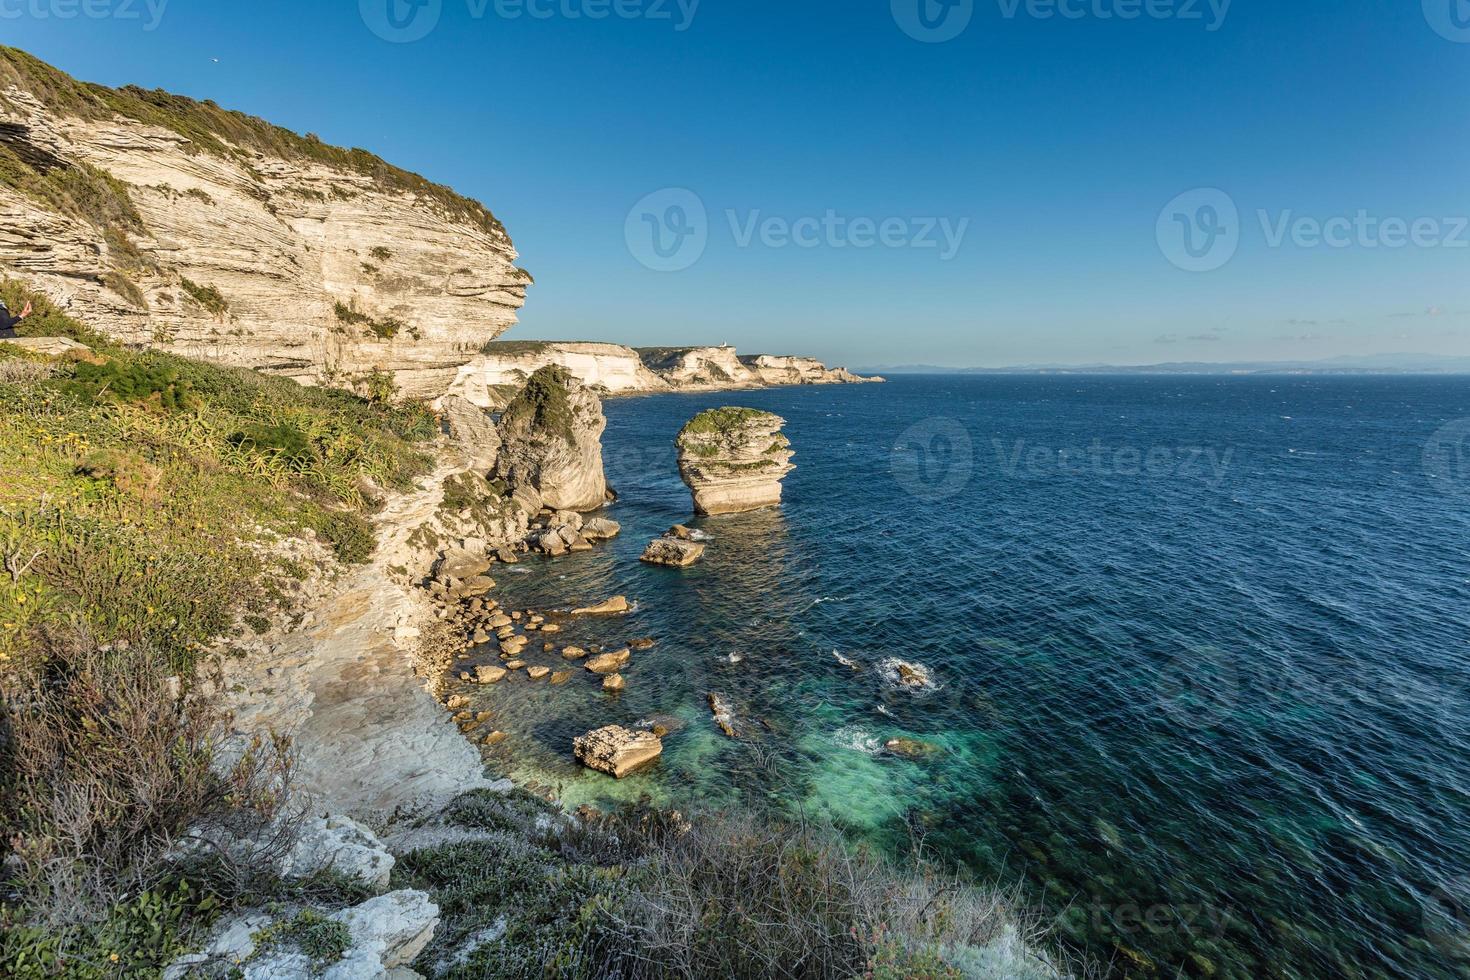 White cliffs, stacks and Mediterranean at Bonifacio in Corsica photo